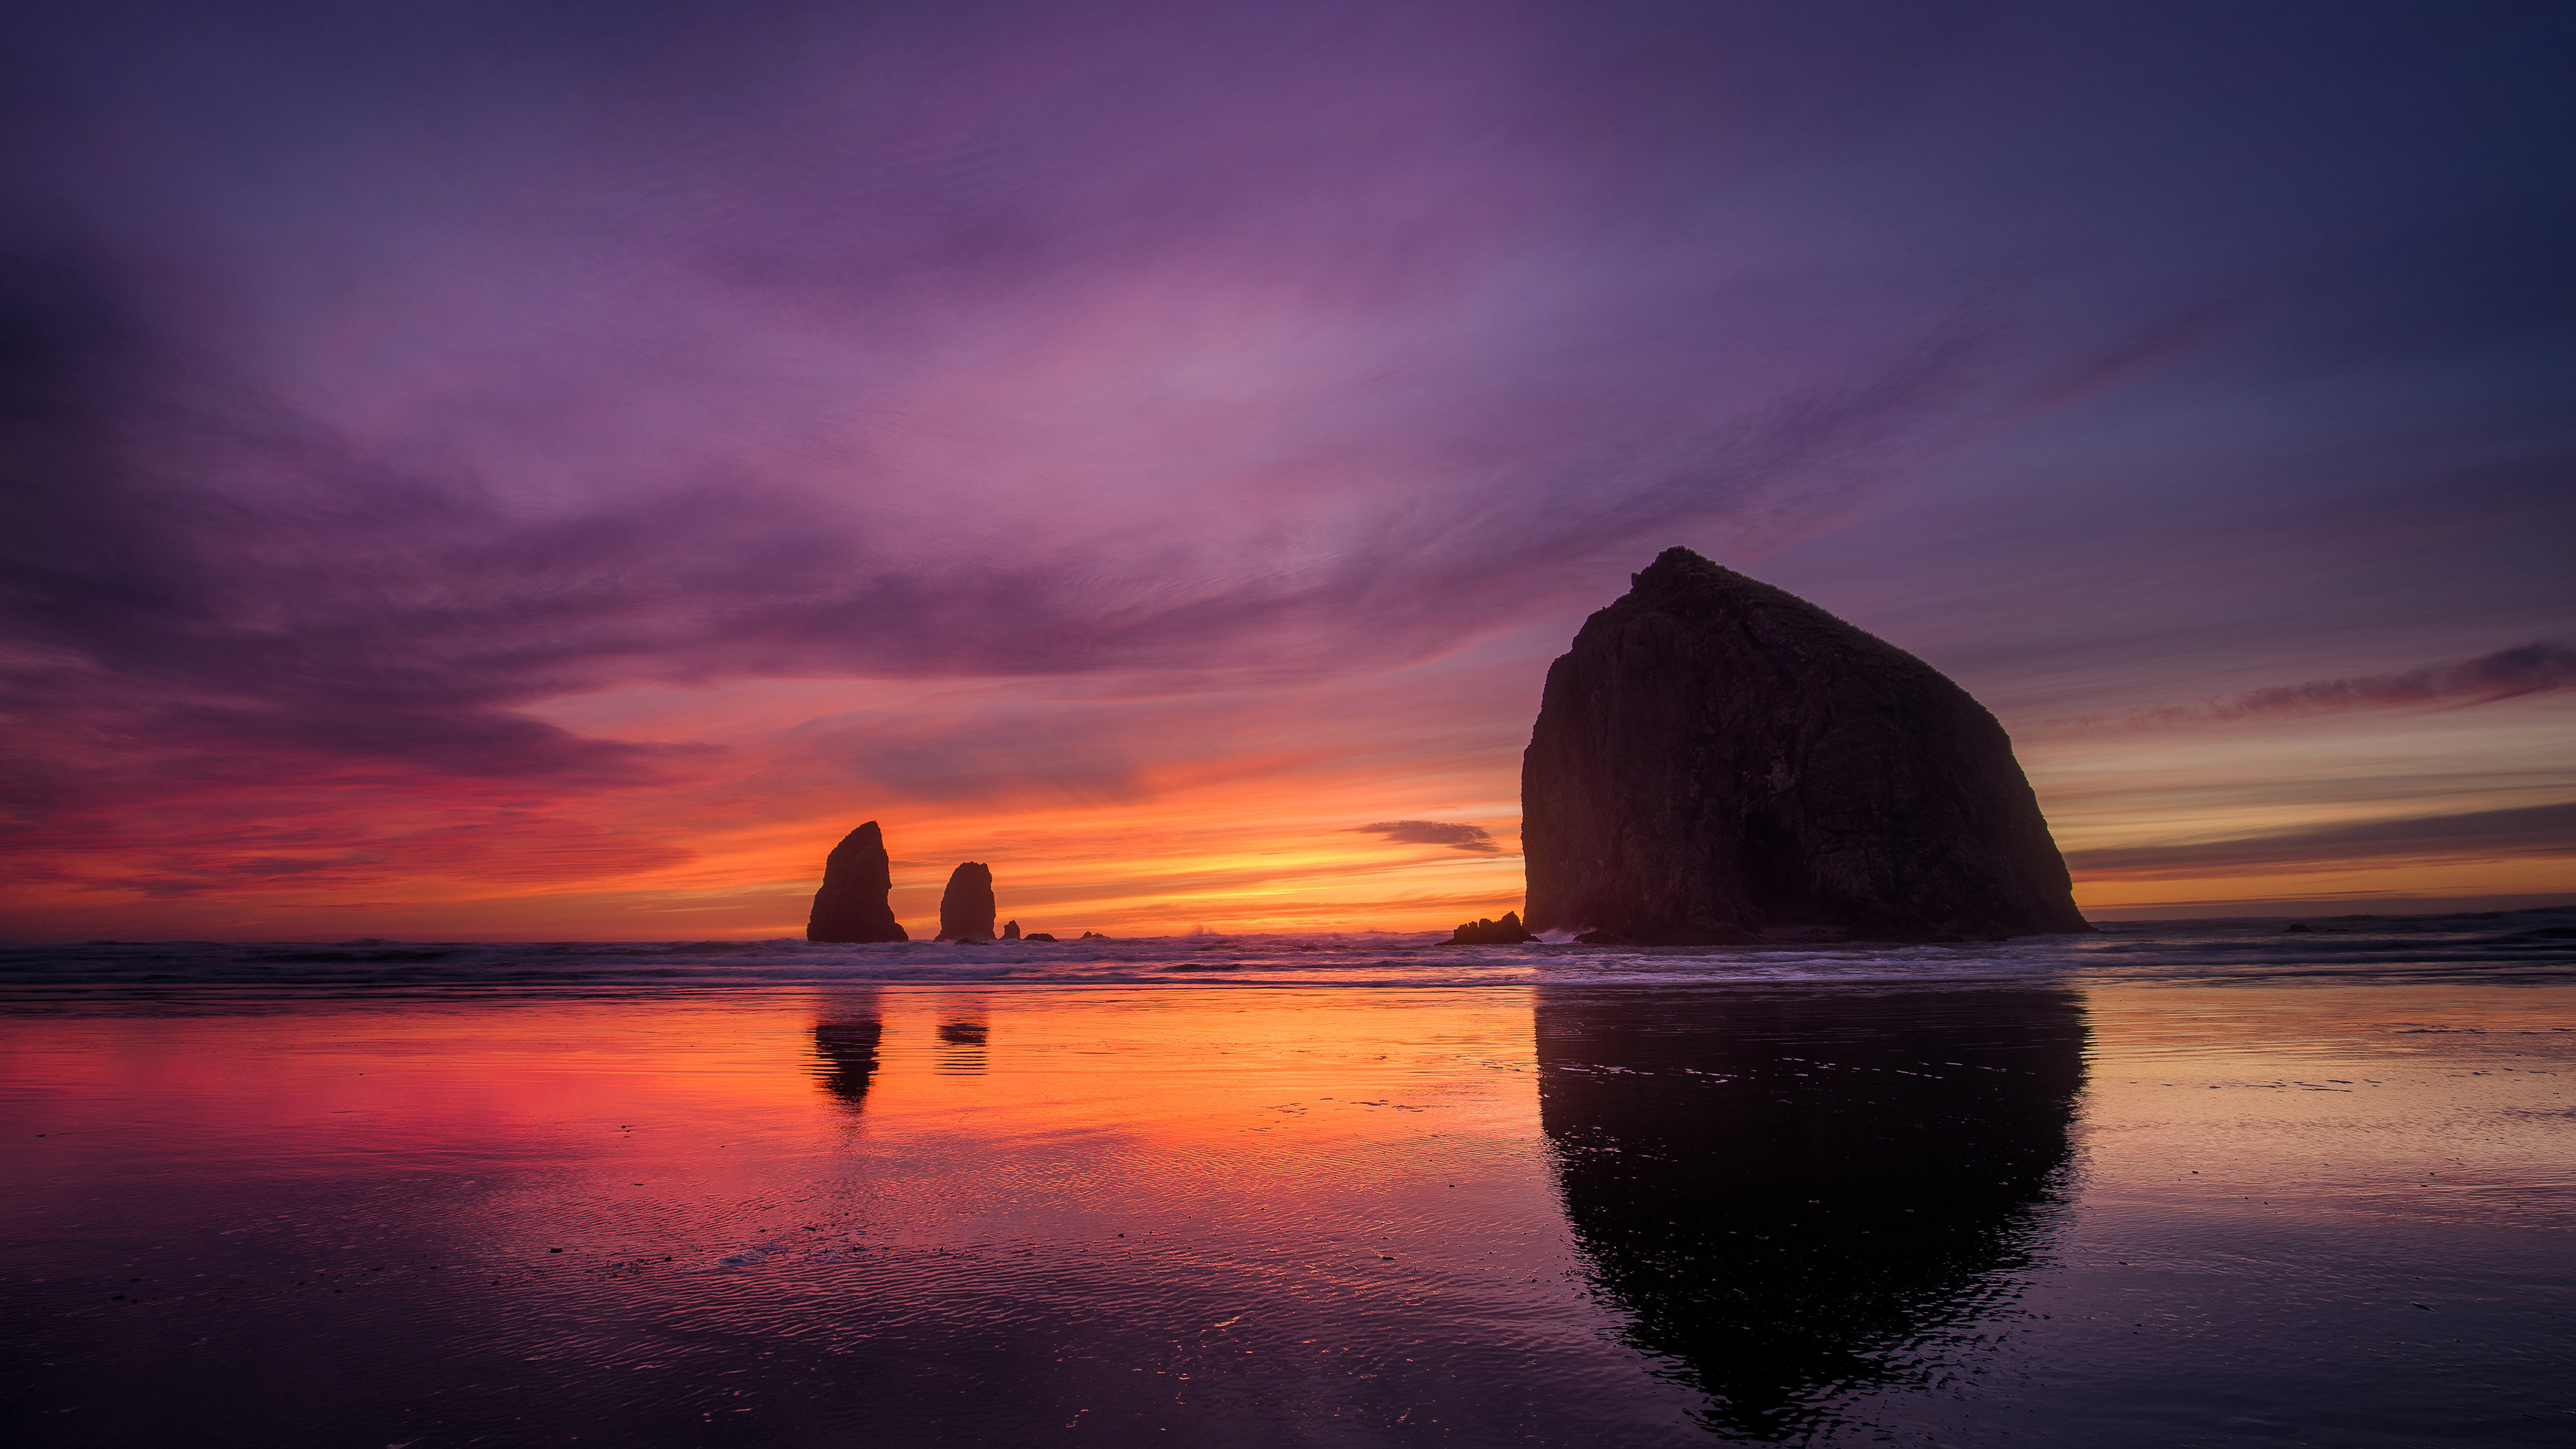 cannon beach sunset 4k 1540132765 - Cannon Beach Sunset 4k - sunset wallpapers, nature wallpapers, hd-wallpapers, cannon wallpapers, beach wallpapers, 4k-wallpapers